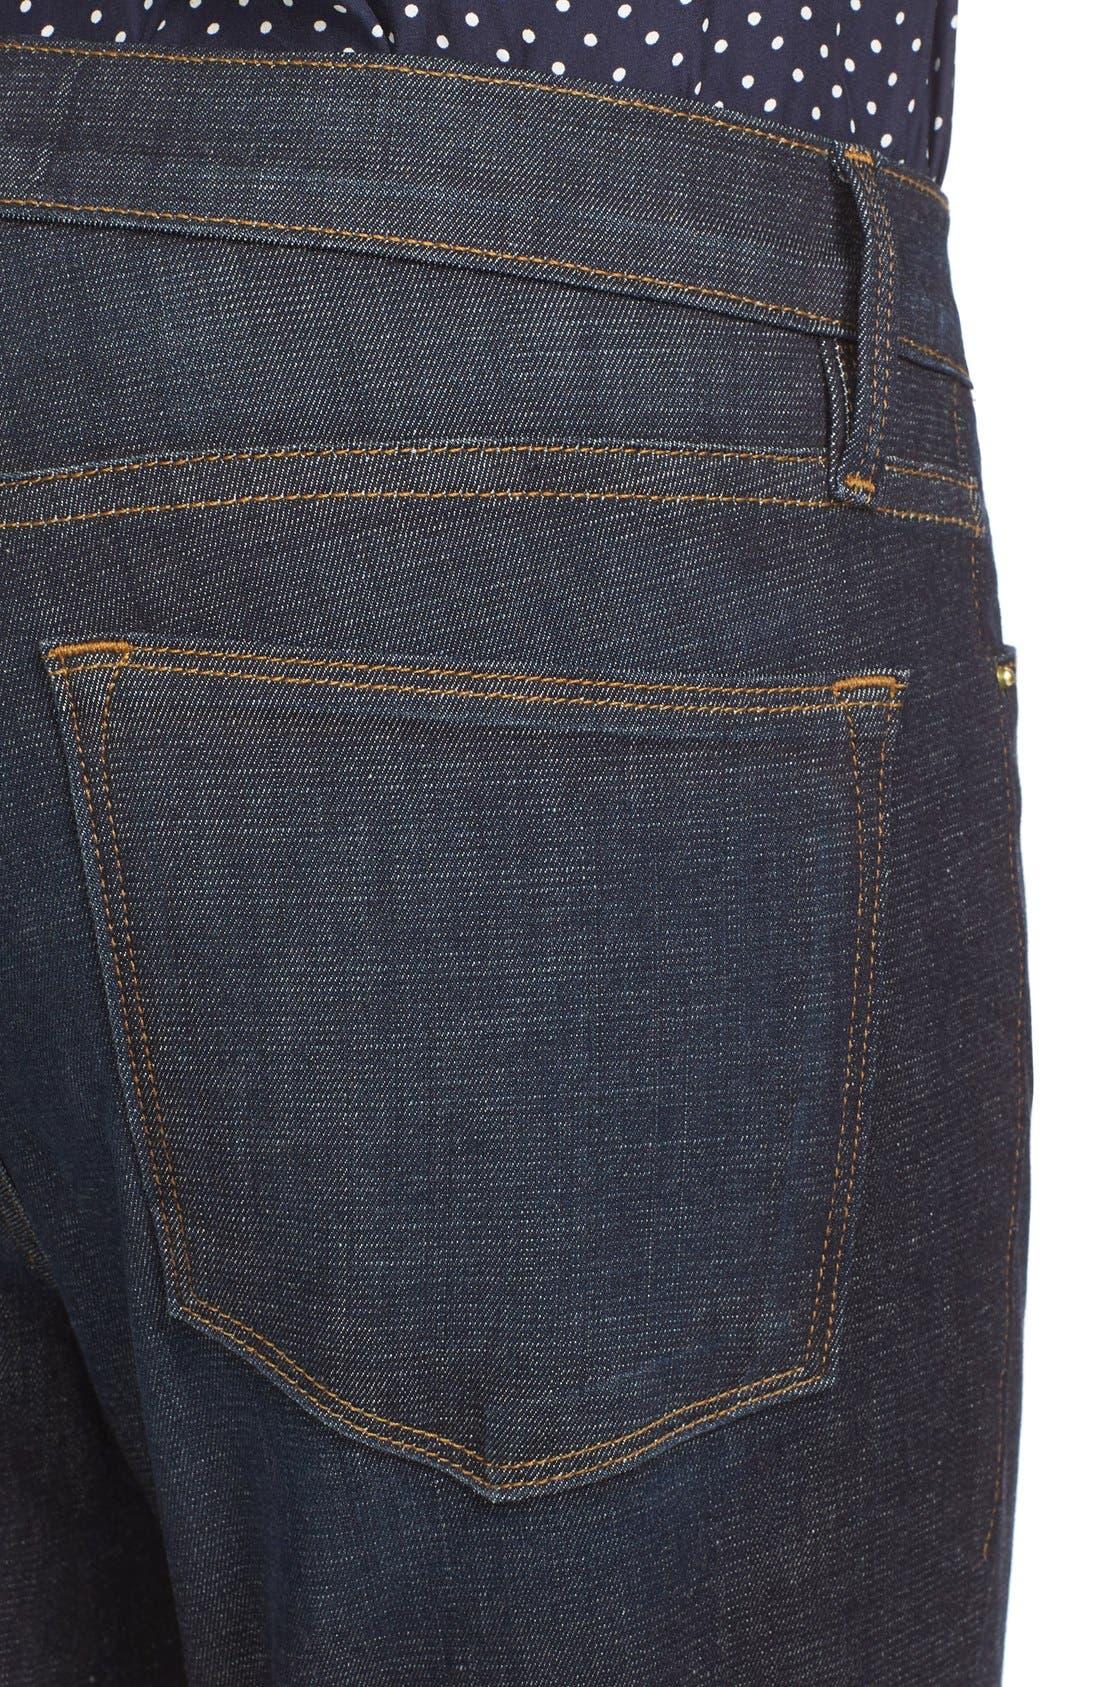 High Waist Skinny Jeans,                             Alternate thumbnail 4, color,                             SALTAIR